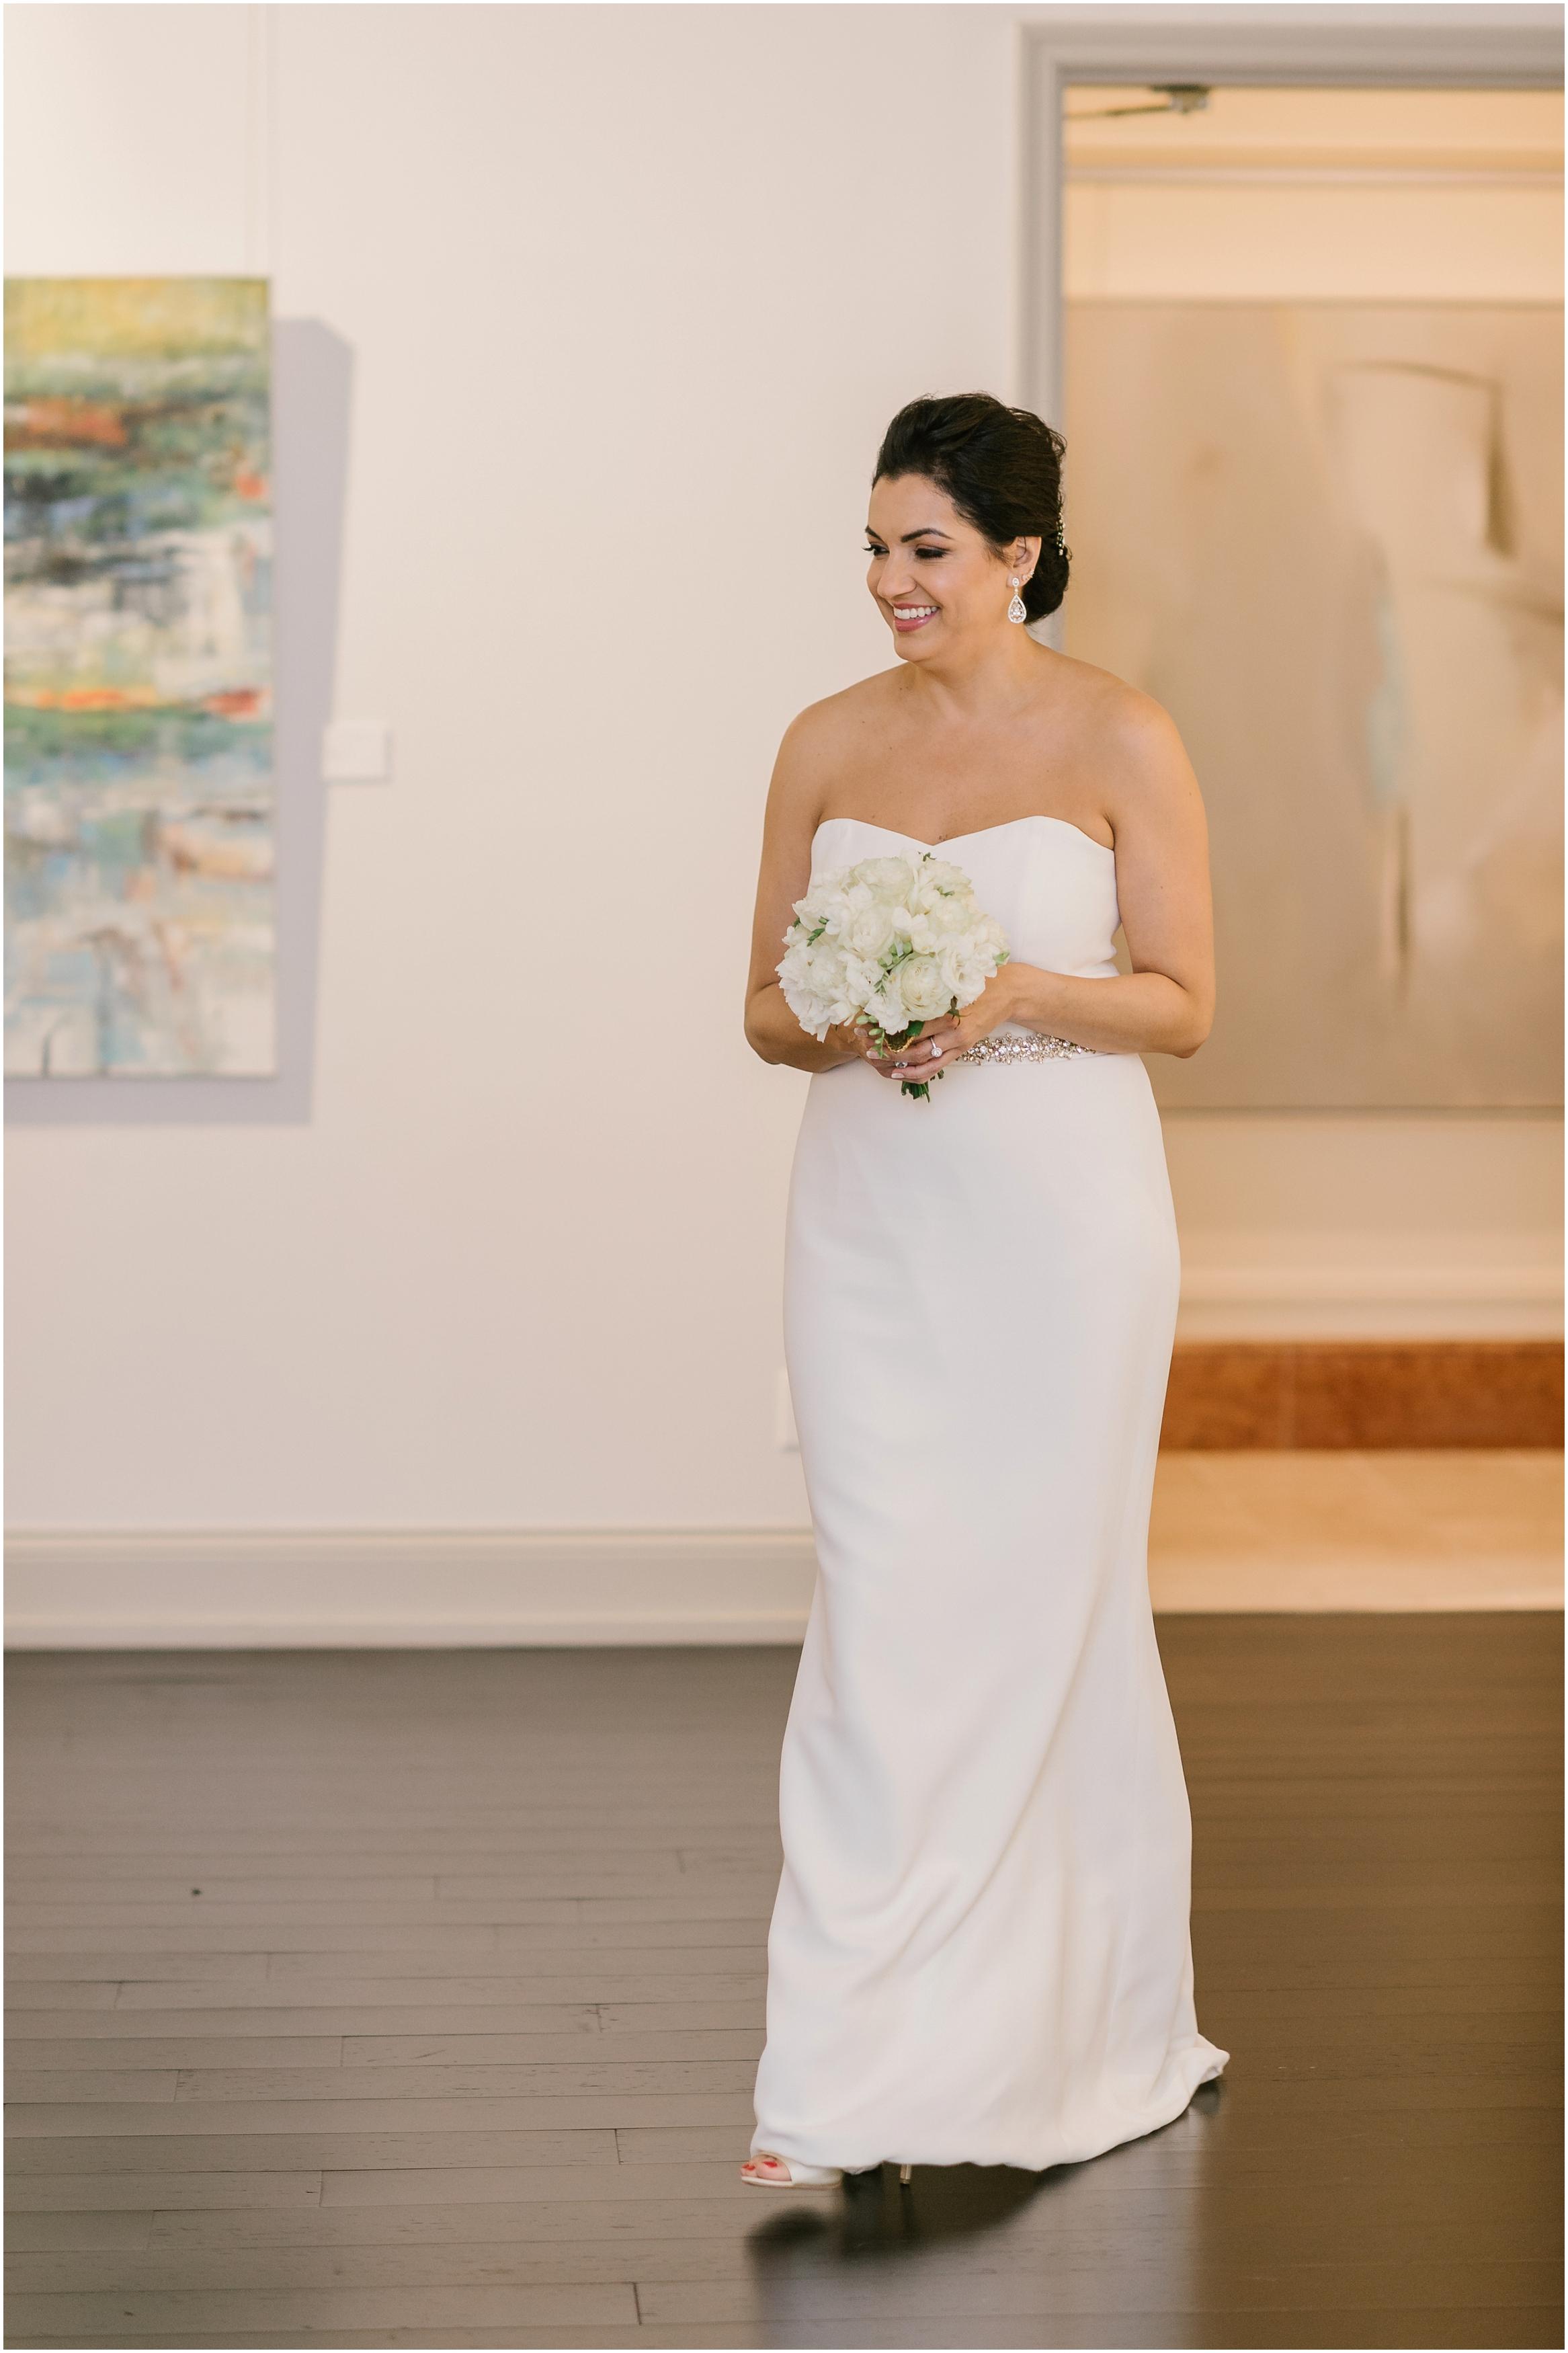 Rebecca_Shehorn_Photography_Indianapolis_Wedding_Photographer_8556.jpg